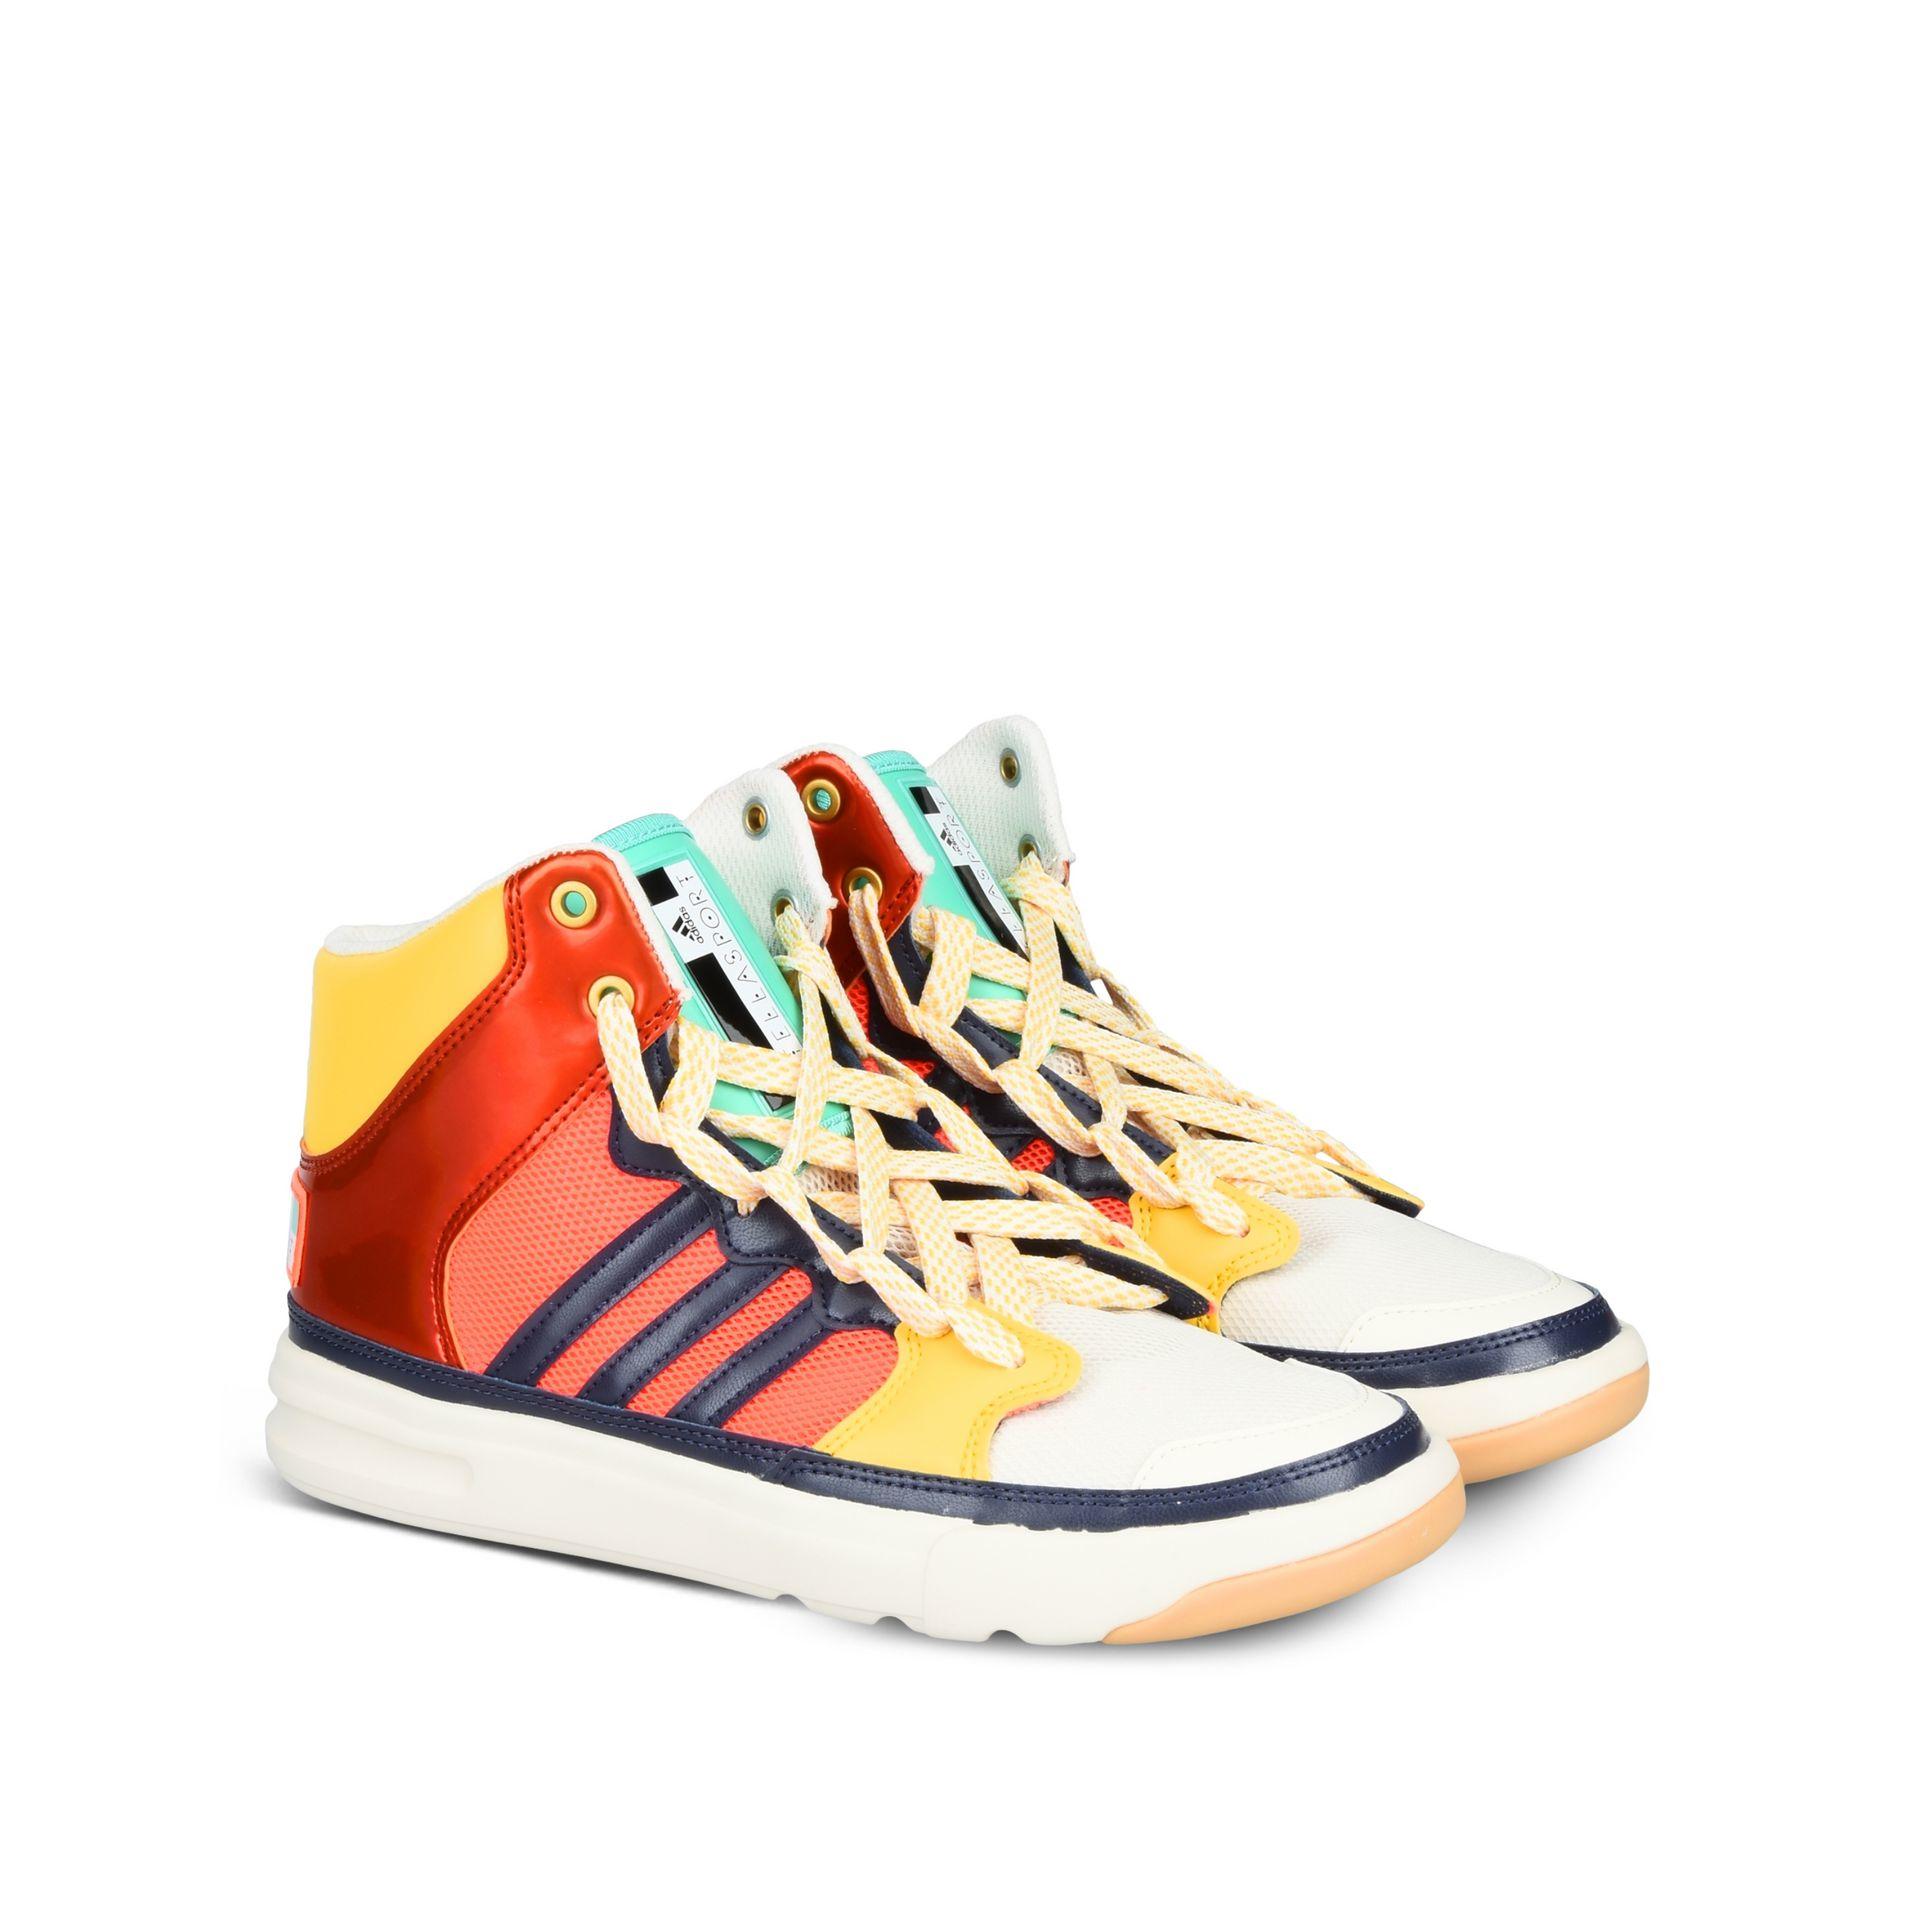 Ganz und zu Extrem Lyst - Adidas By Stella Mccartney Irana Striped Faux-Leather Sneakers #EA_21